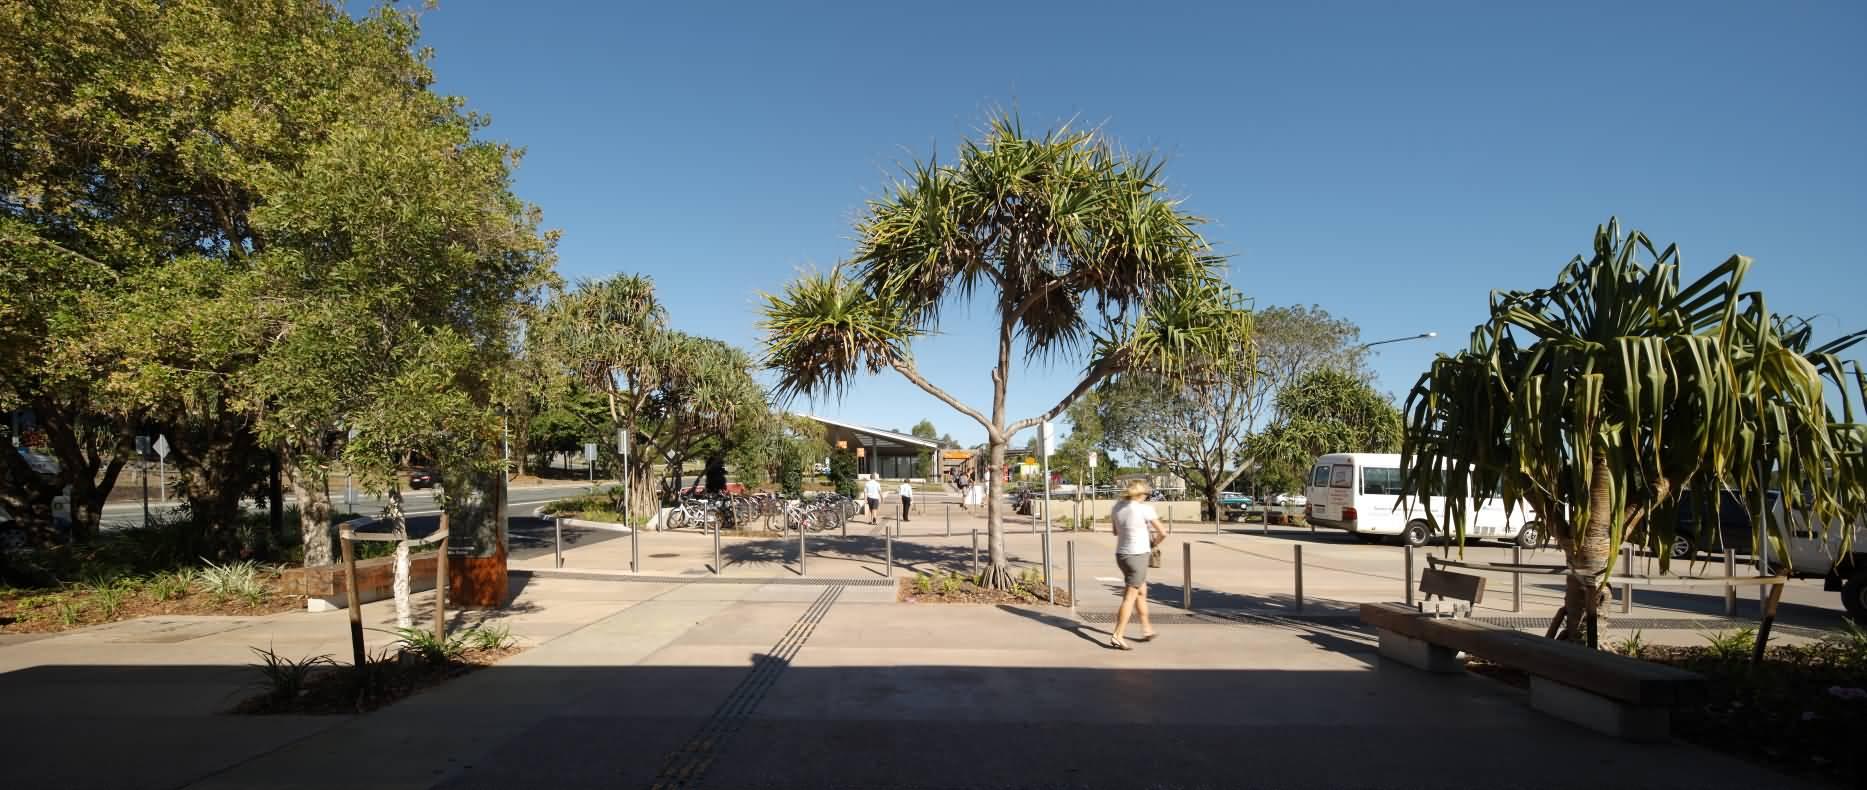 Noosa_Junction Station_Guymer_Bailey_Landscape 2.JPG